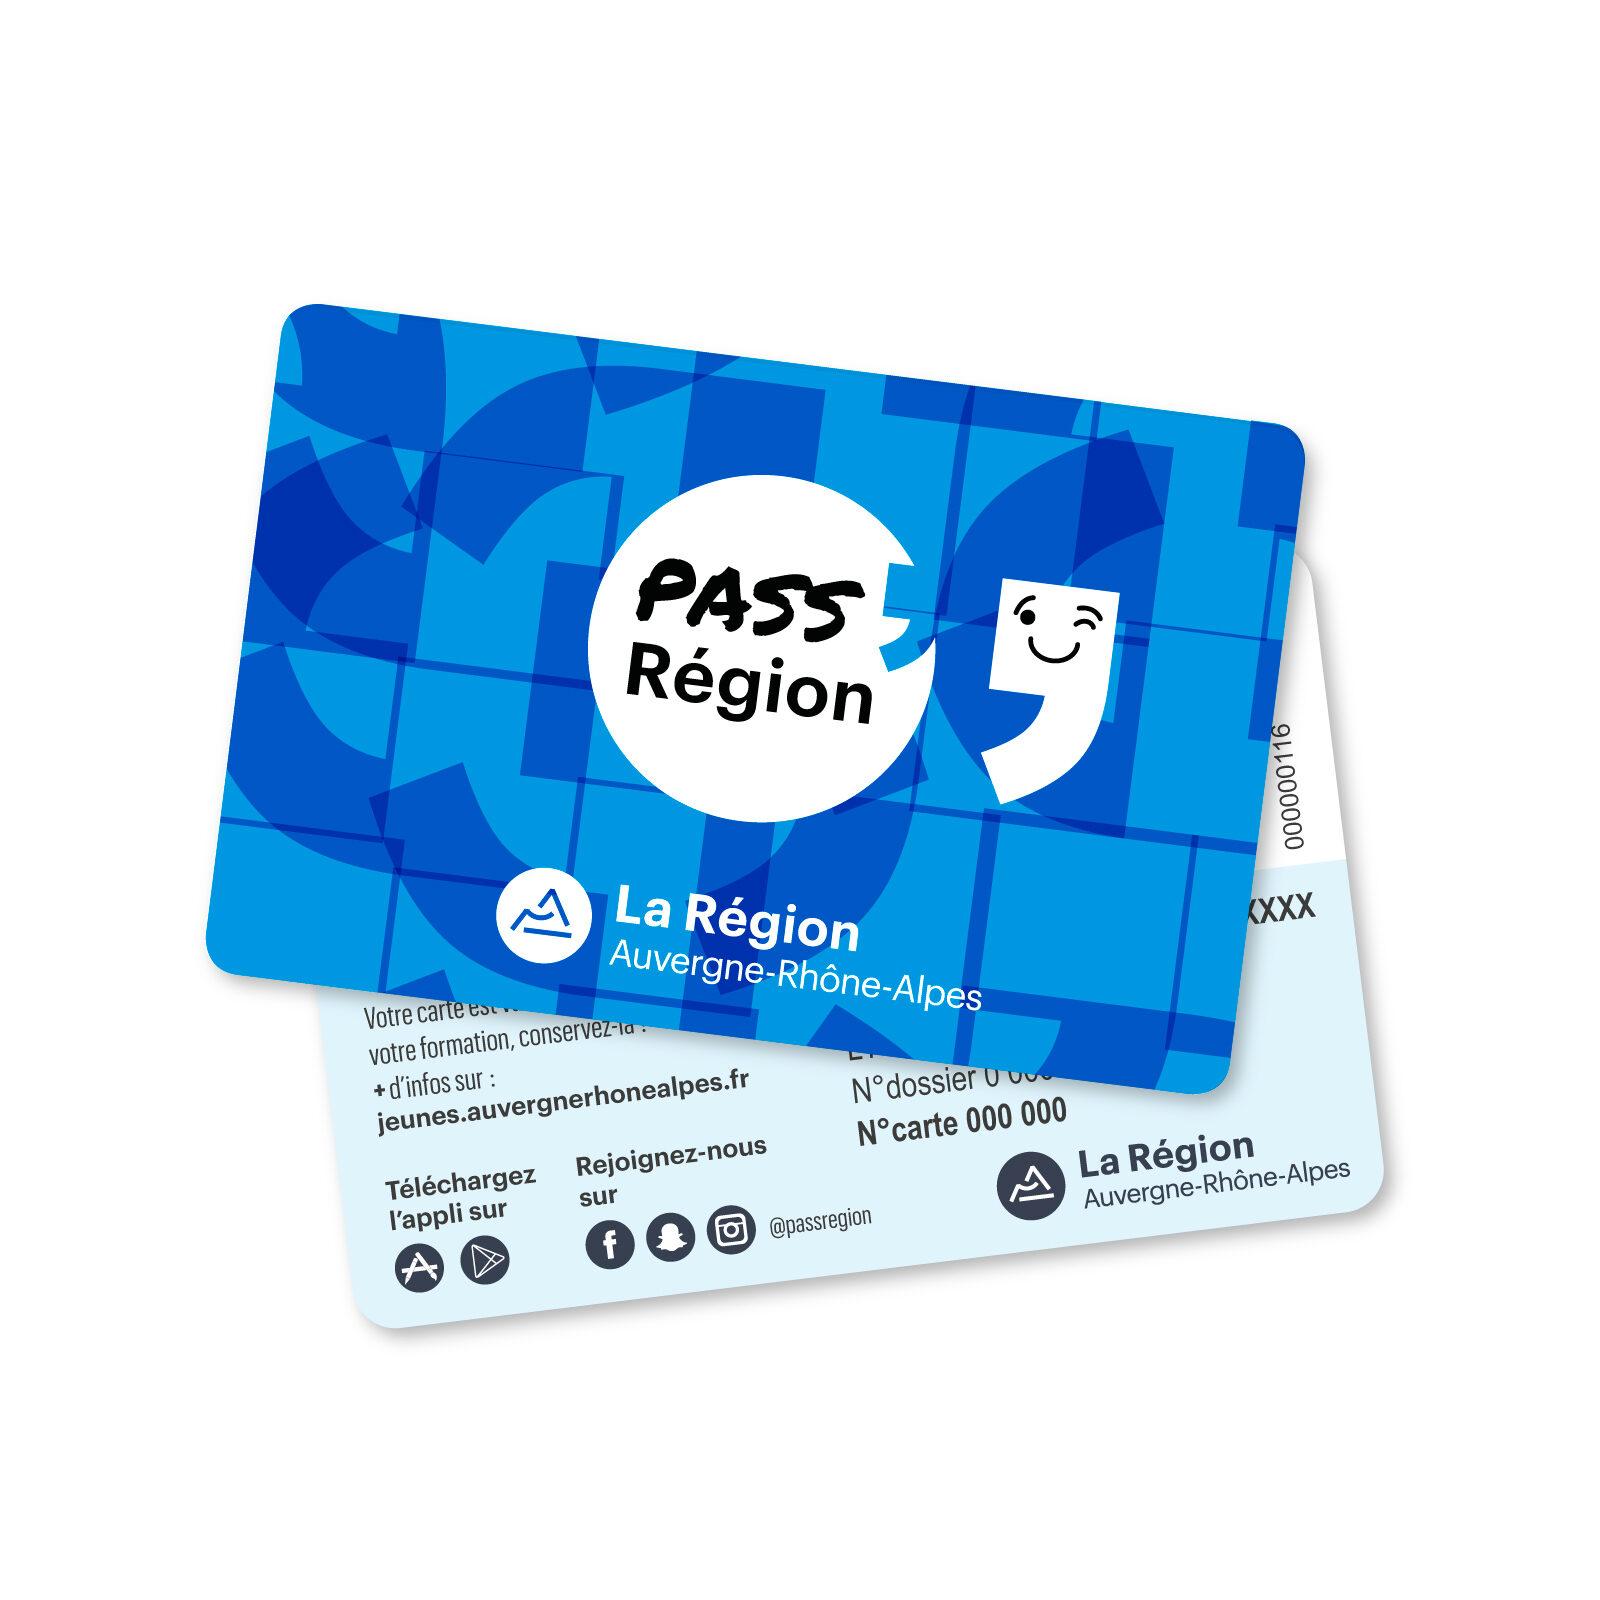 PassRegion-Web-carte-1600x1600DEF.jpg